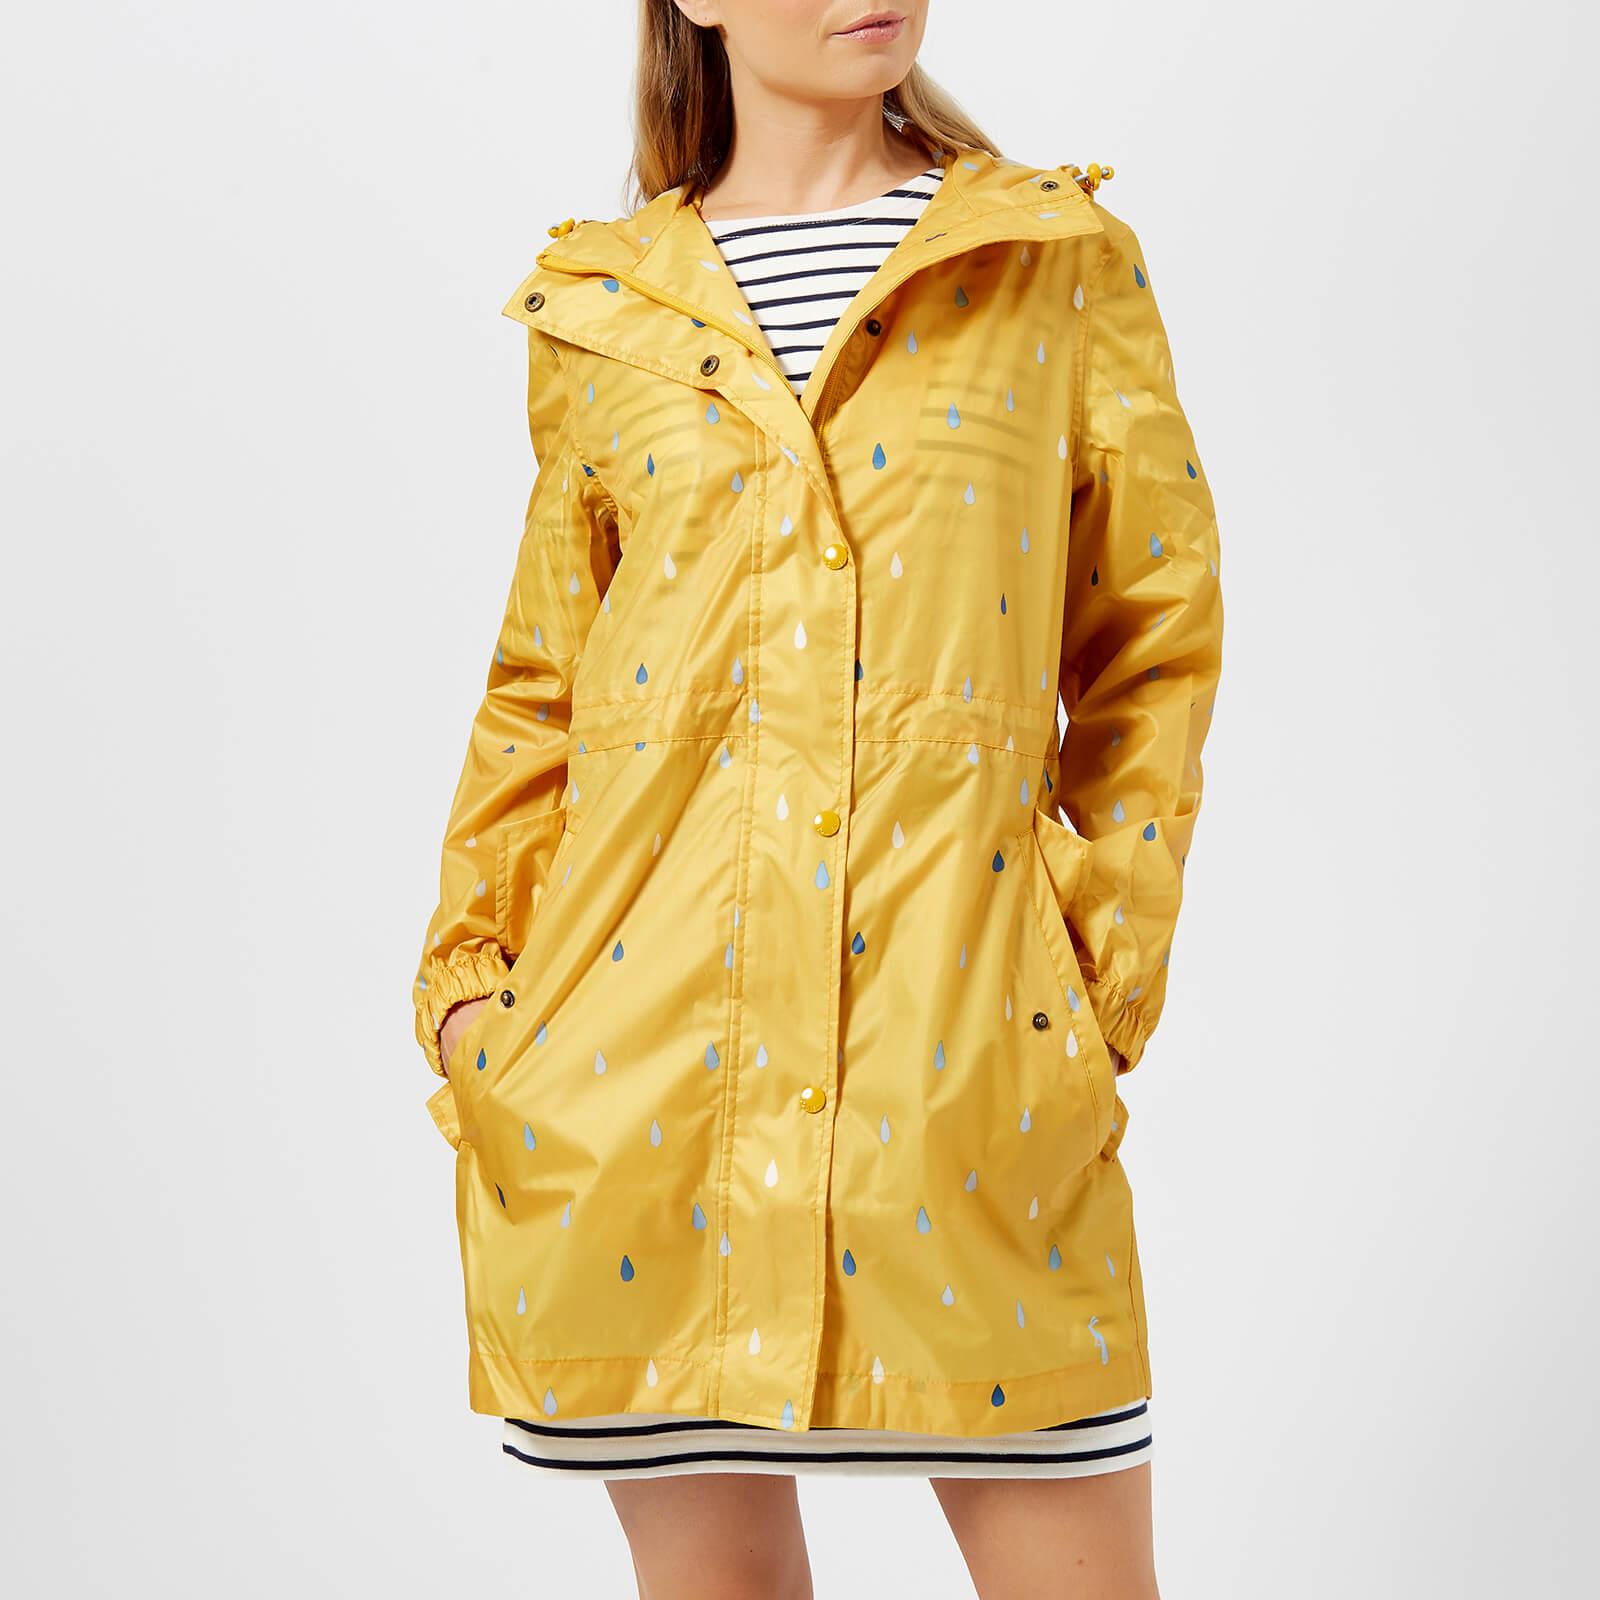 13644bf94 Joules Women's Golightly Waterproof Packaway Coat - Antique Gold Raindrops Womens  Clothing | TheHut.com